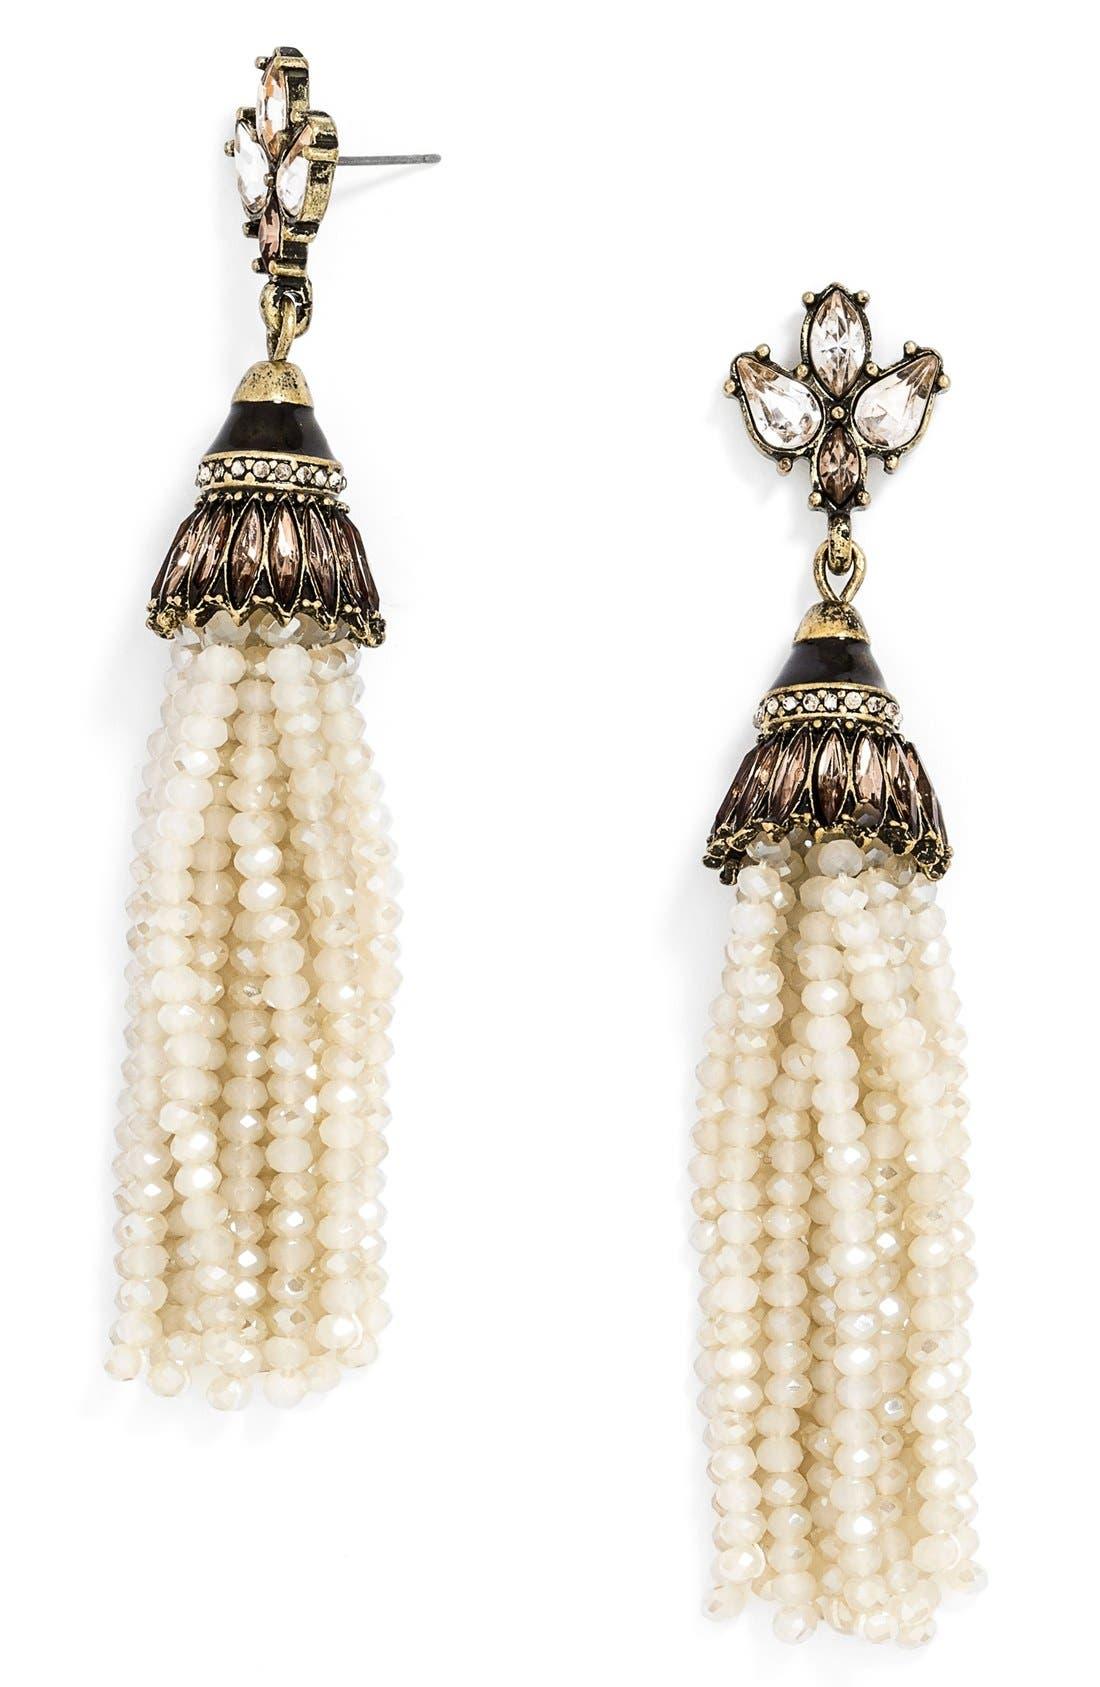 Main Image - BaubleBar 'Tinsel' Tassel Drop Earrings